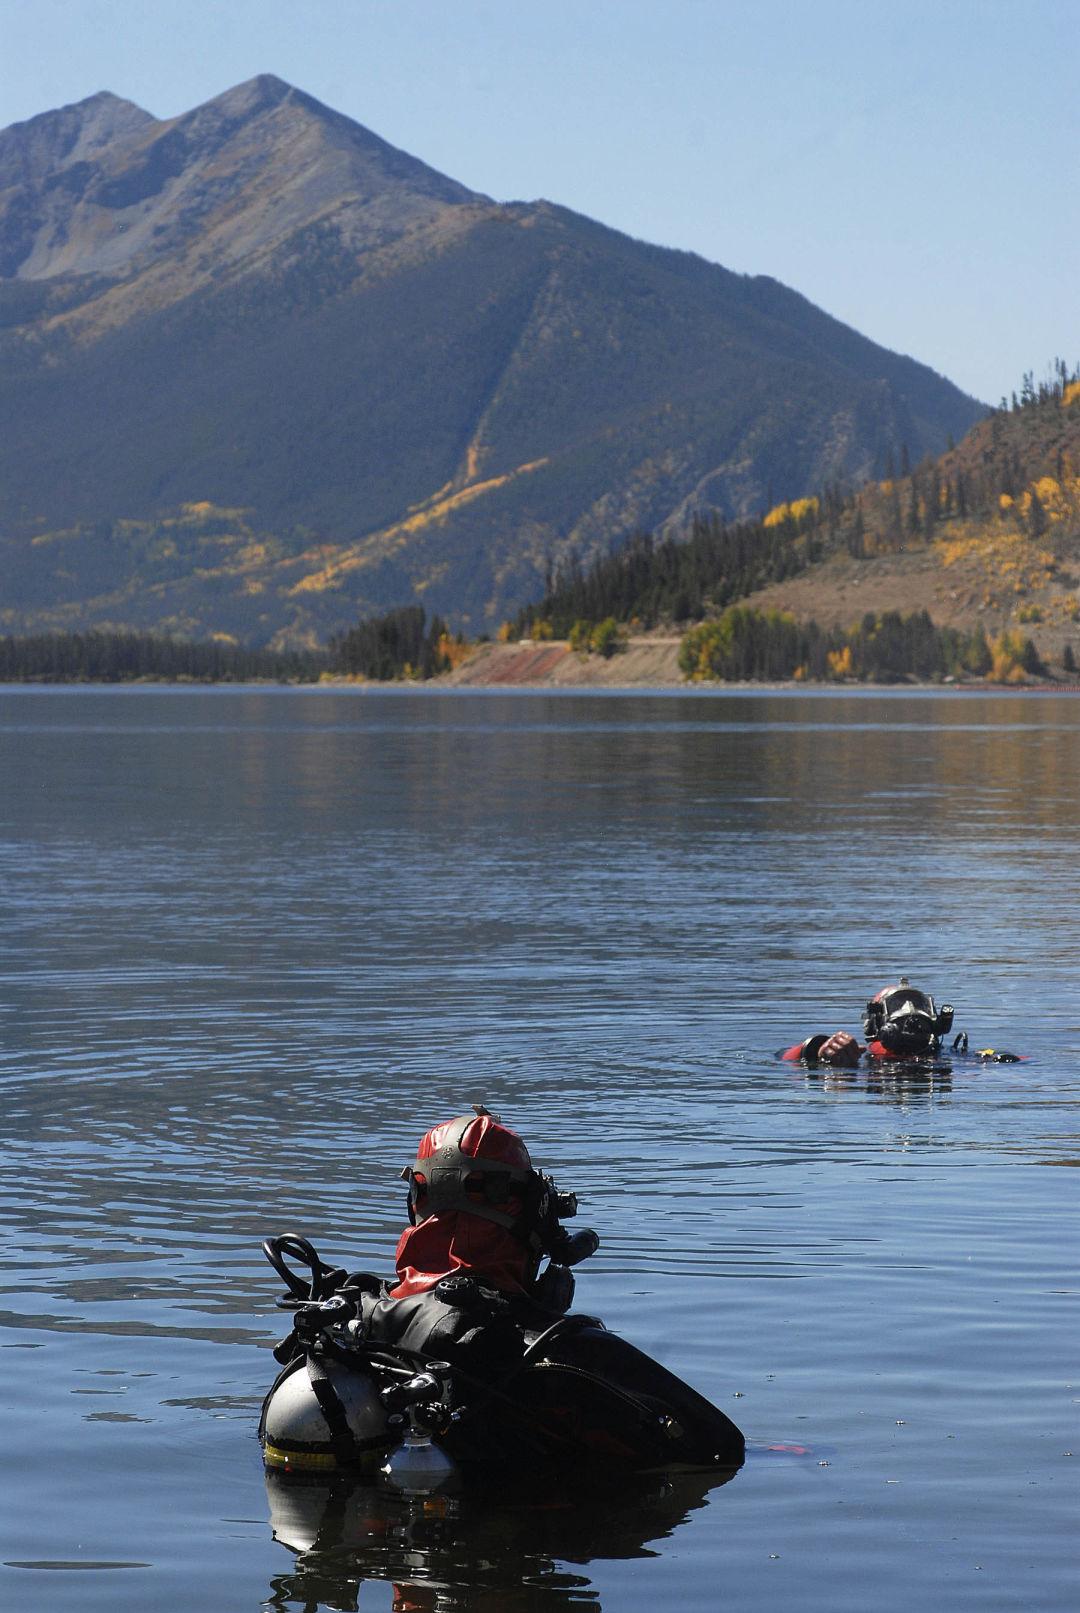 Cosu summer 2012 water rescue koizcb